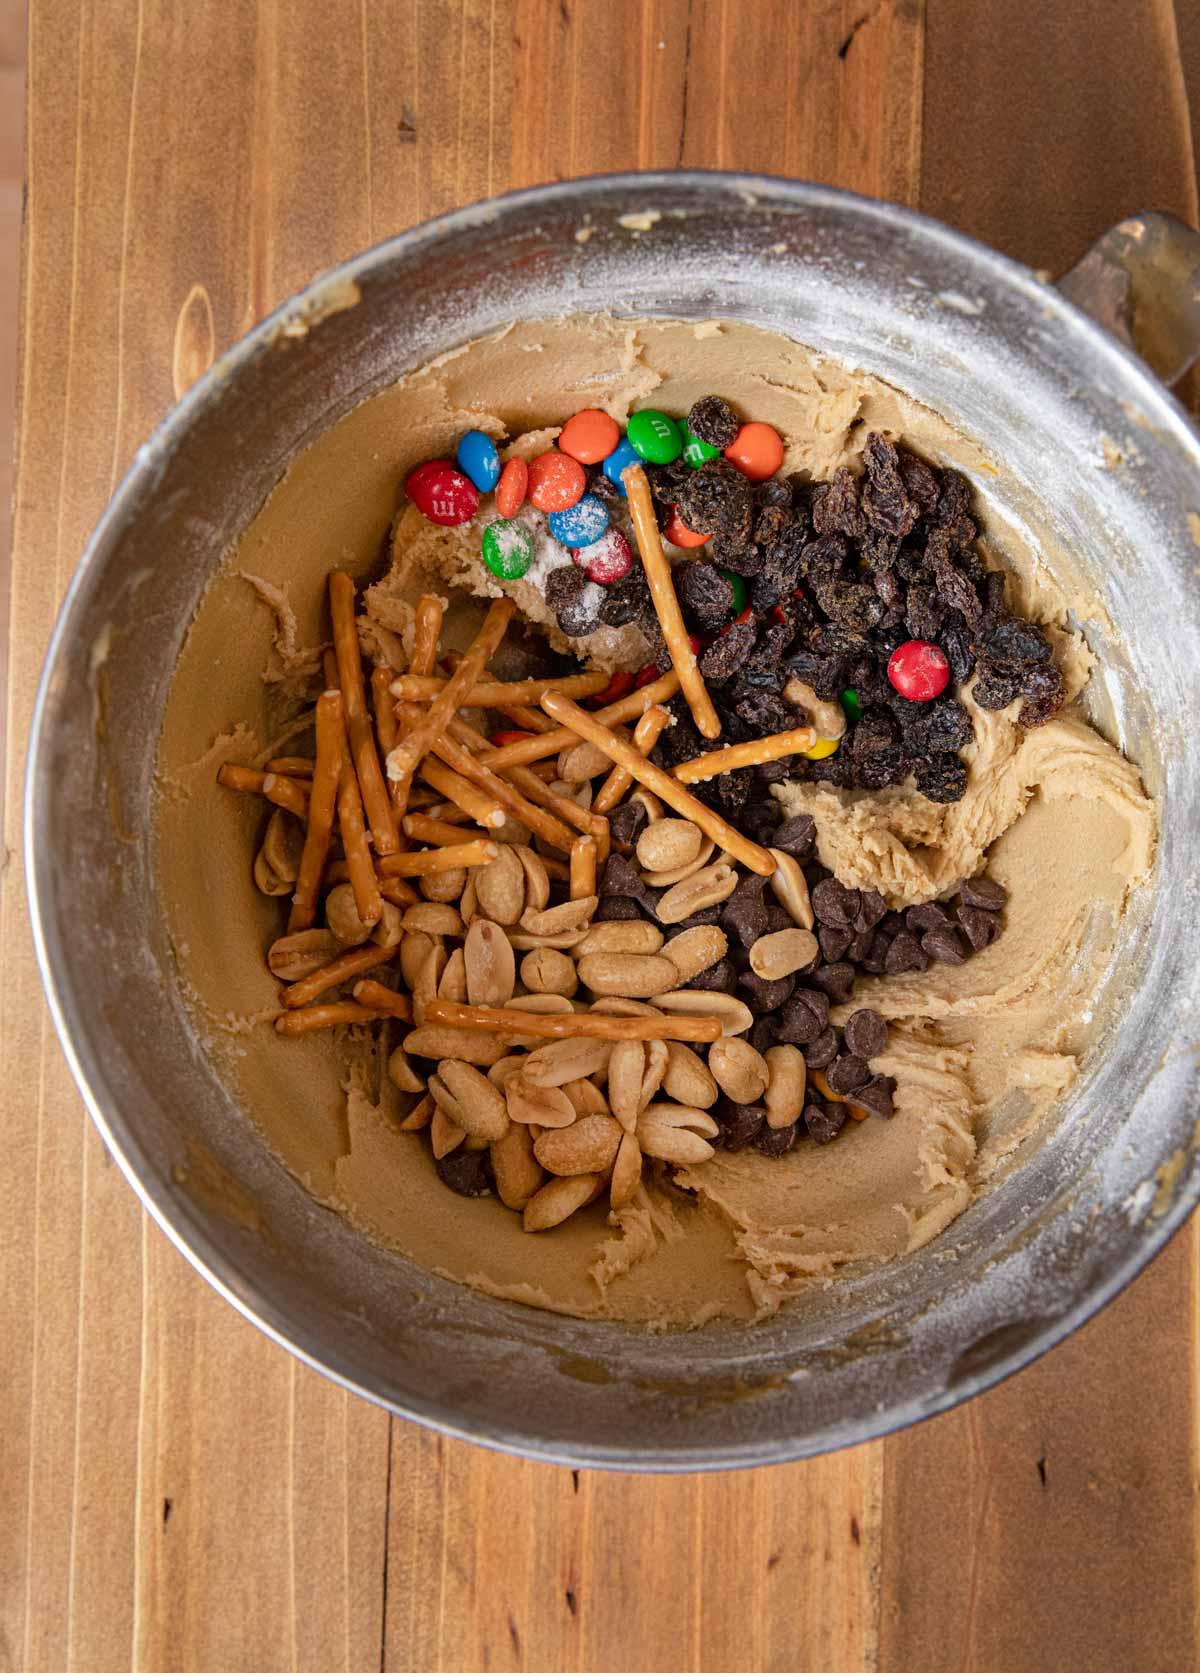 Trail Mix Blondies ingredients in bowl